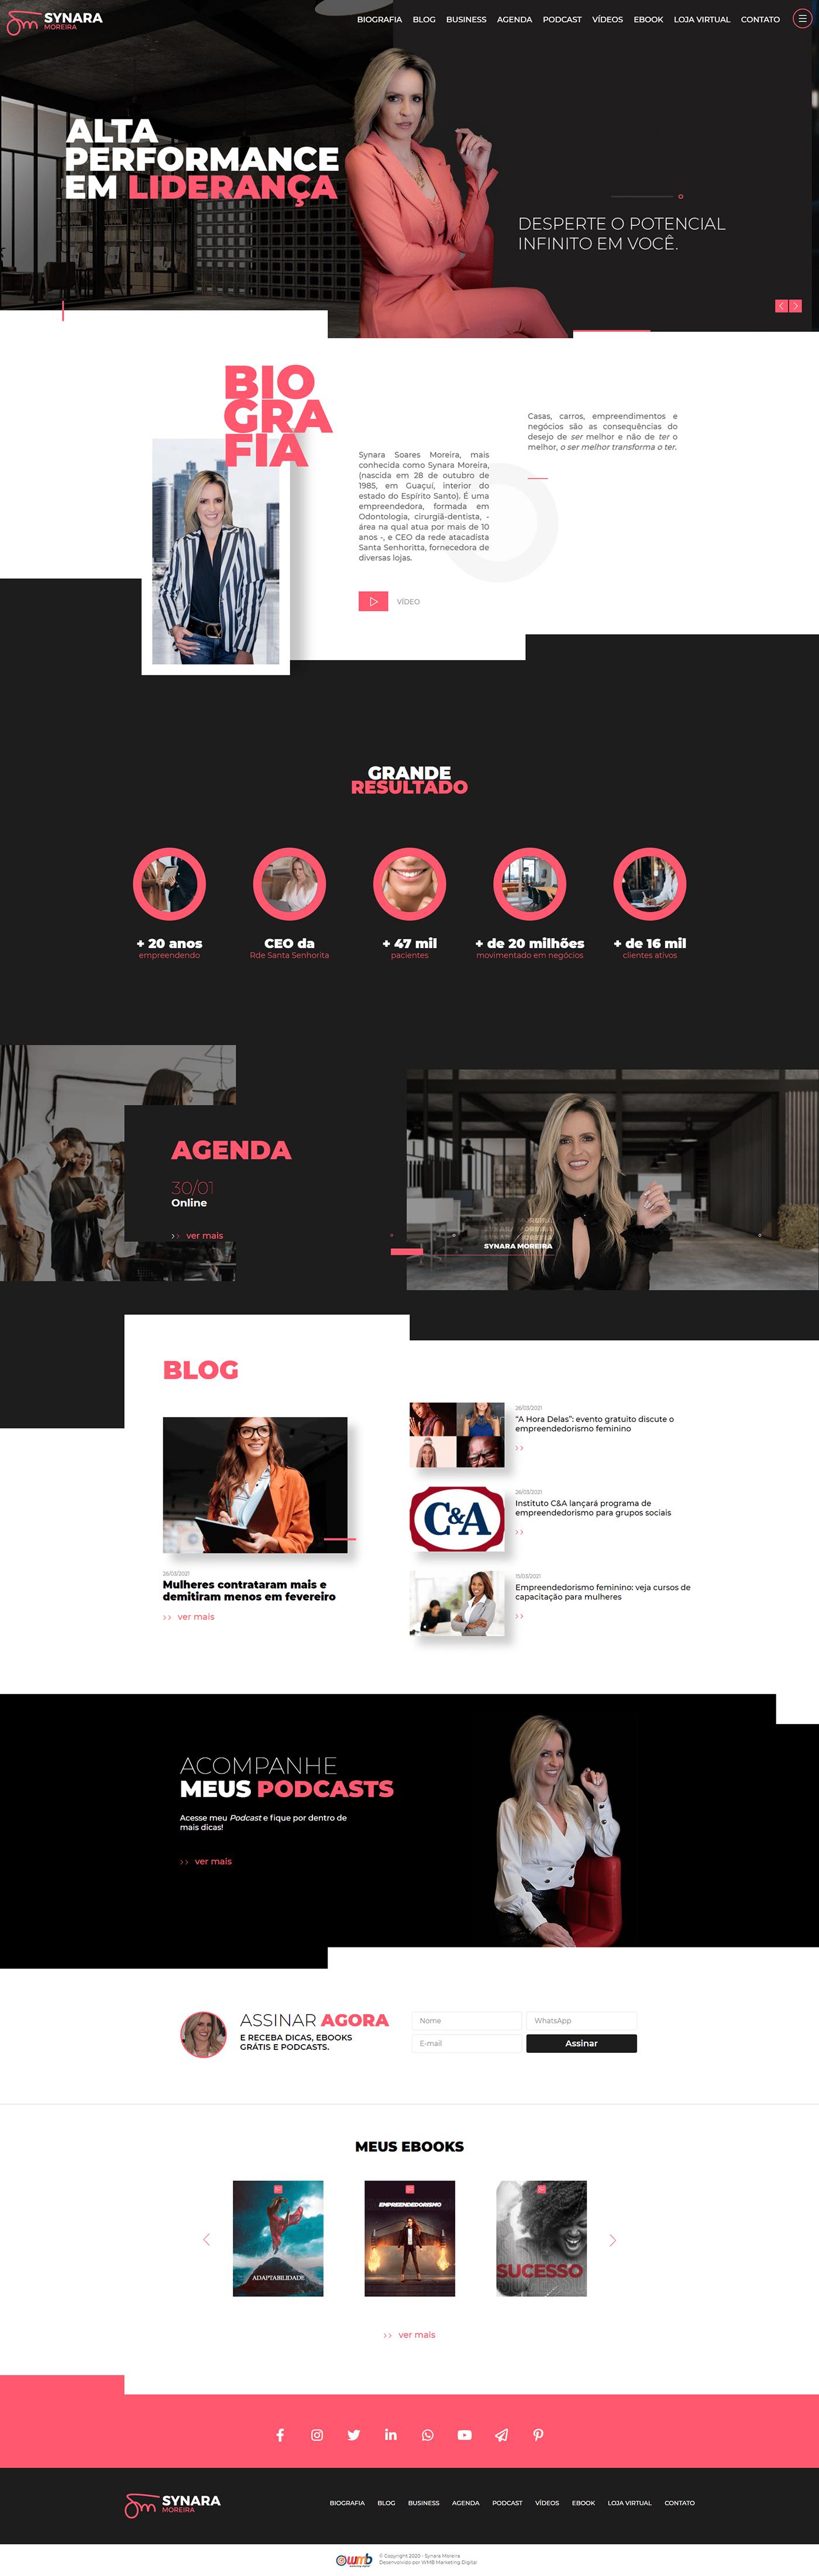 empreendedorismo mulheres site